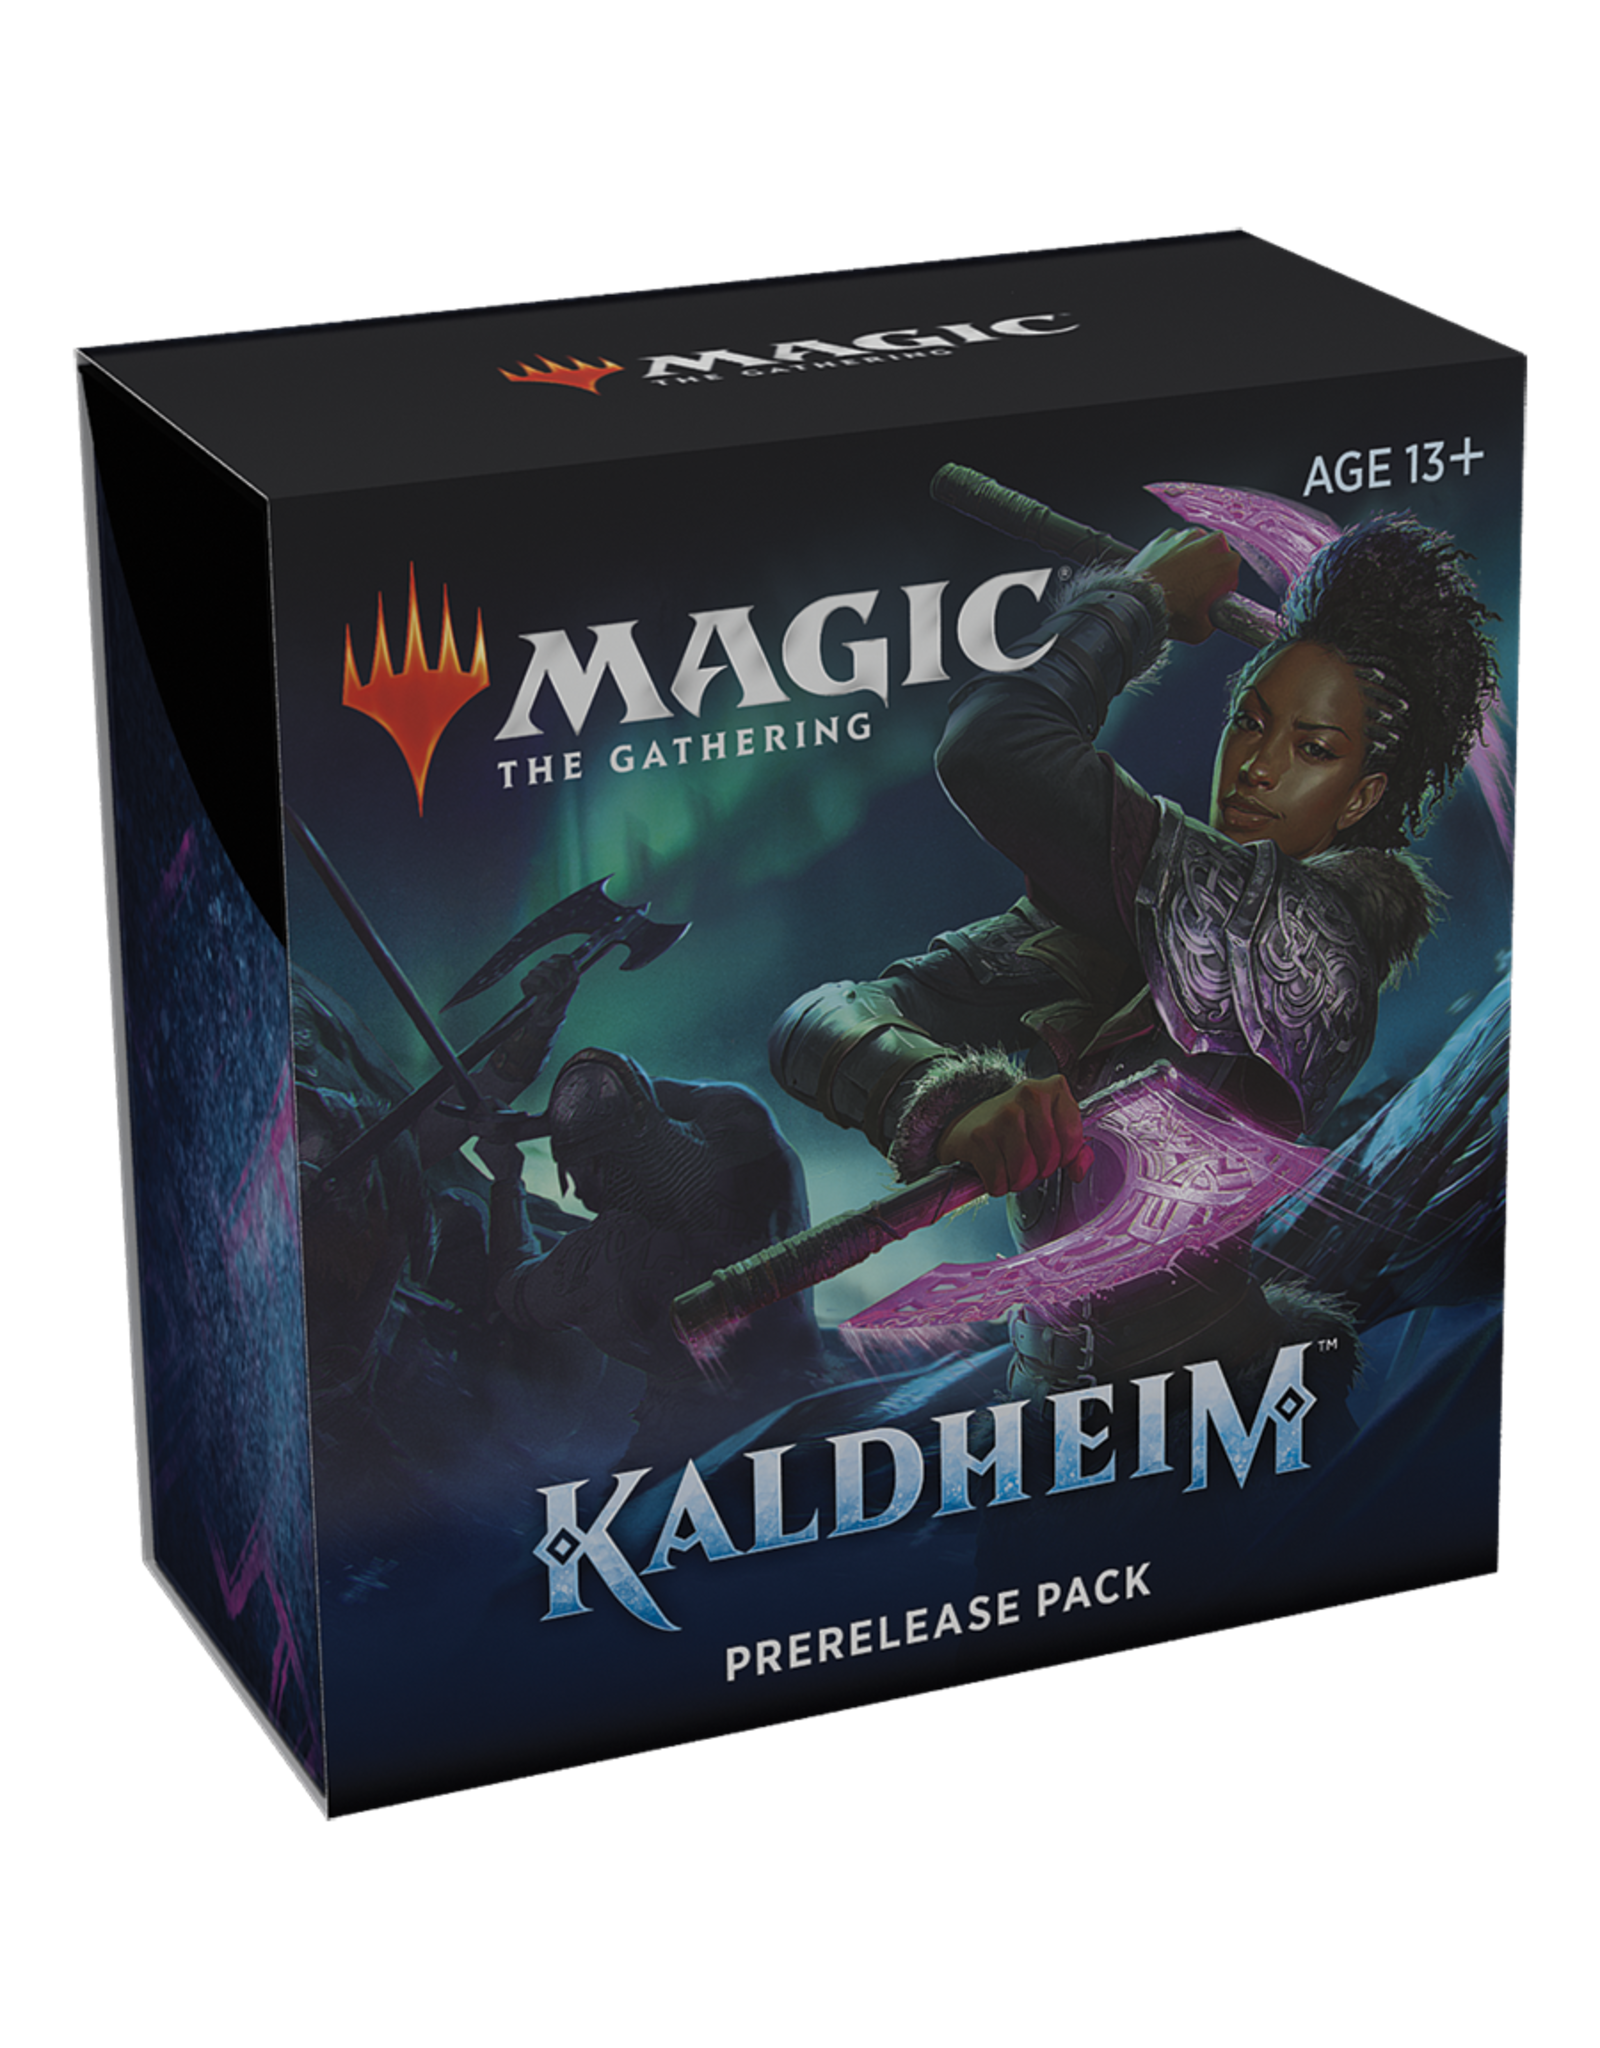 Kaldheim Prerelease Pack - AVAILABLE JAN 29